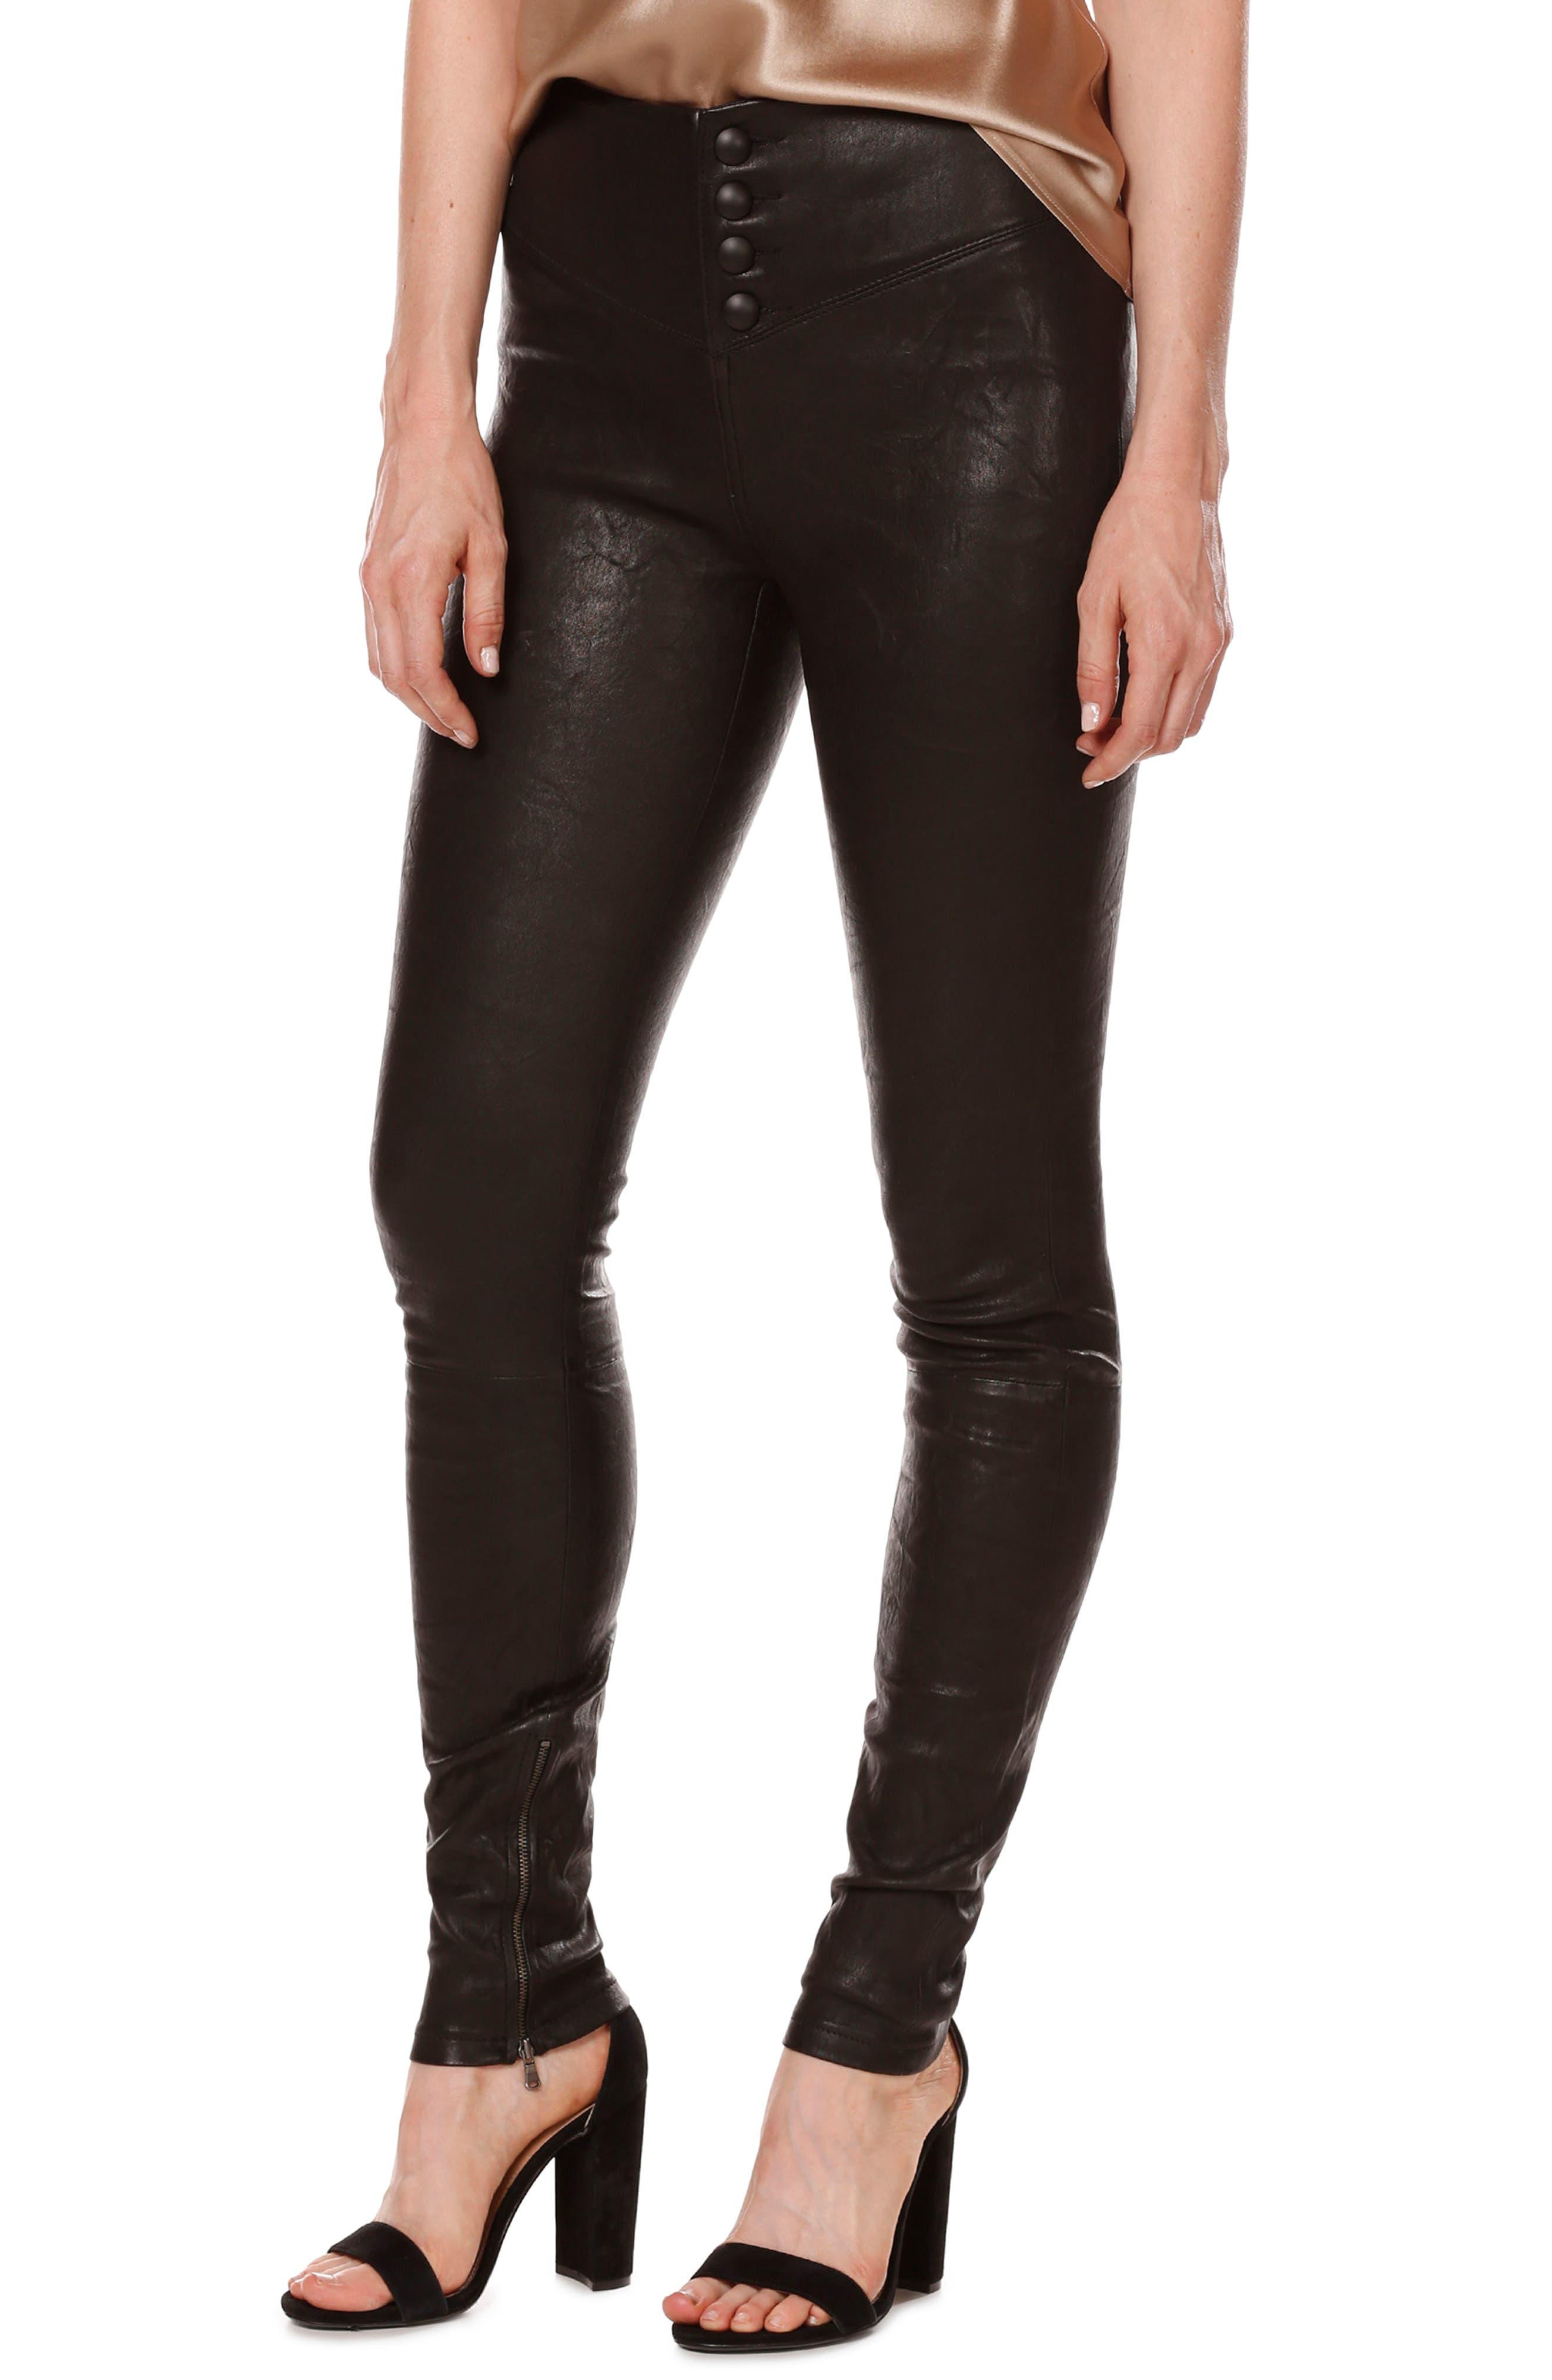 Rosie HW x PAIGE Ellery Ankle Zip Leather Pants,                             Main thumbnail 1, color,                             001